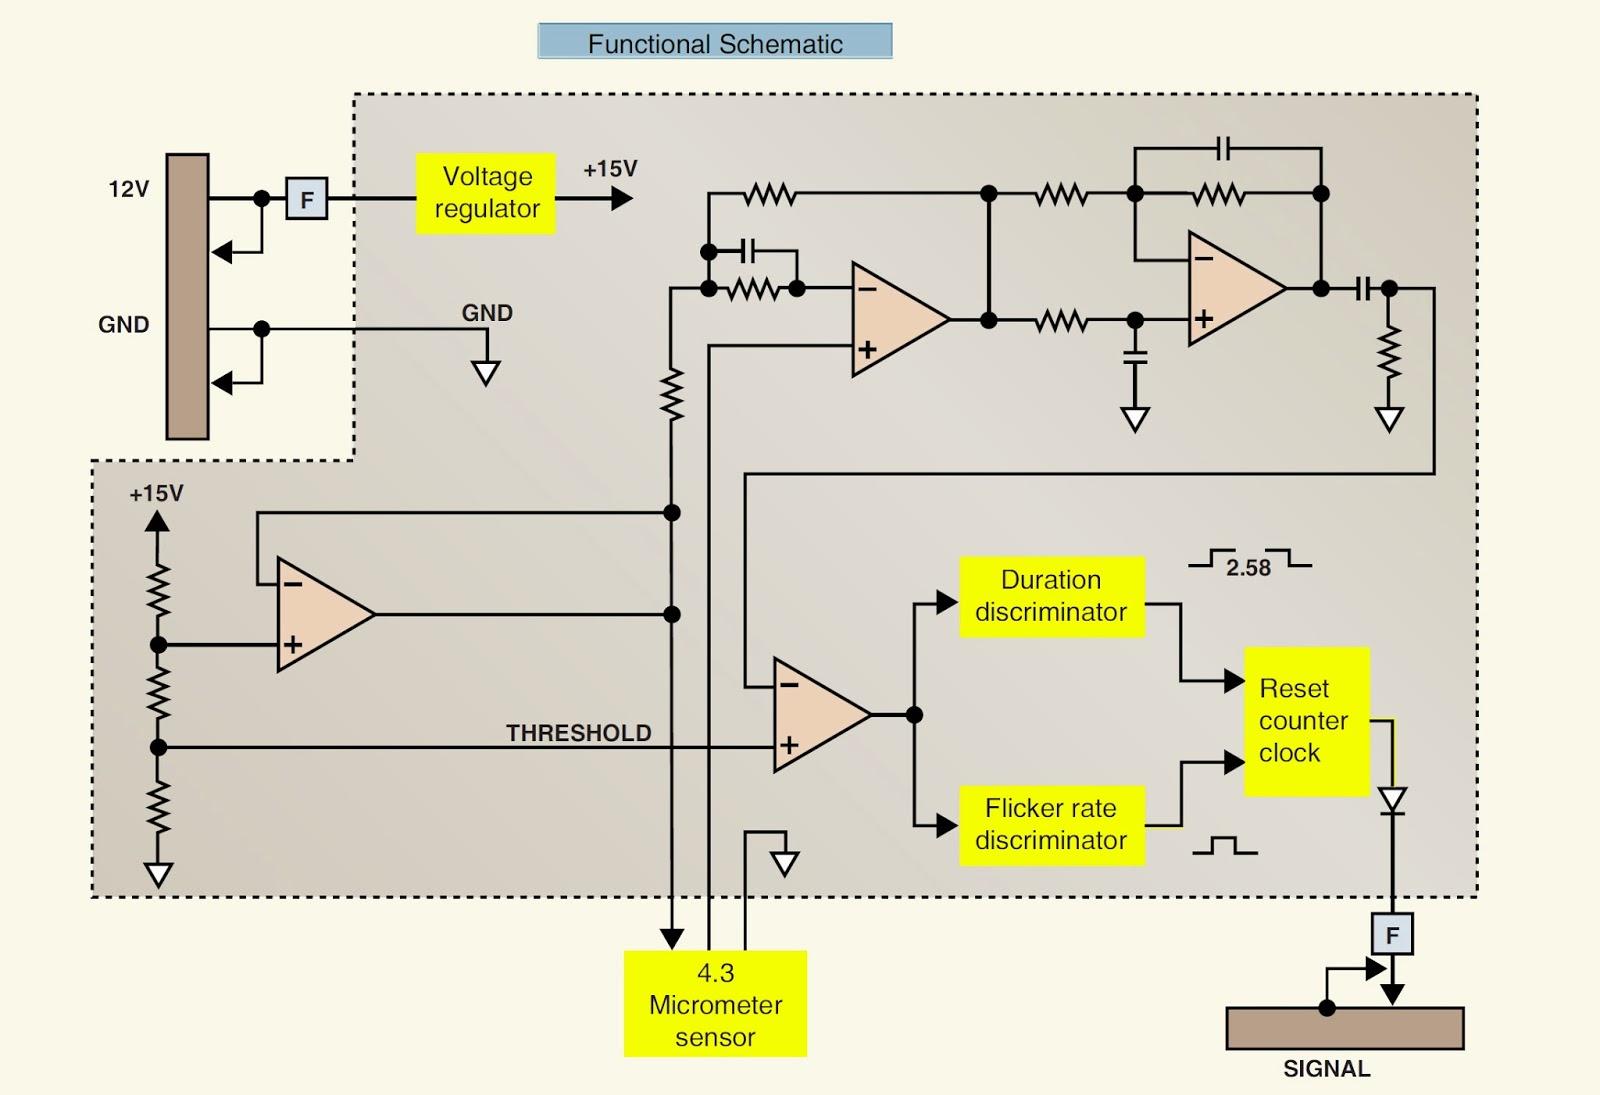 hardwired smoke detector diagram electric foil wiring diagram maytag maxima dryer wiring diagram. Black Bedroom Furniture Sets. Home Design Ideas